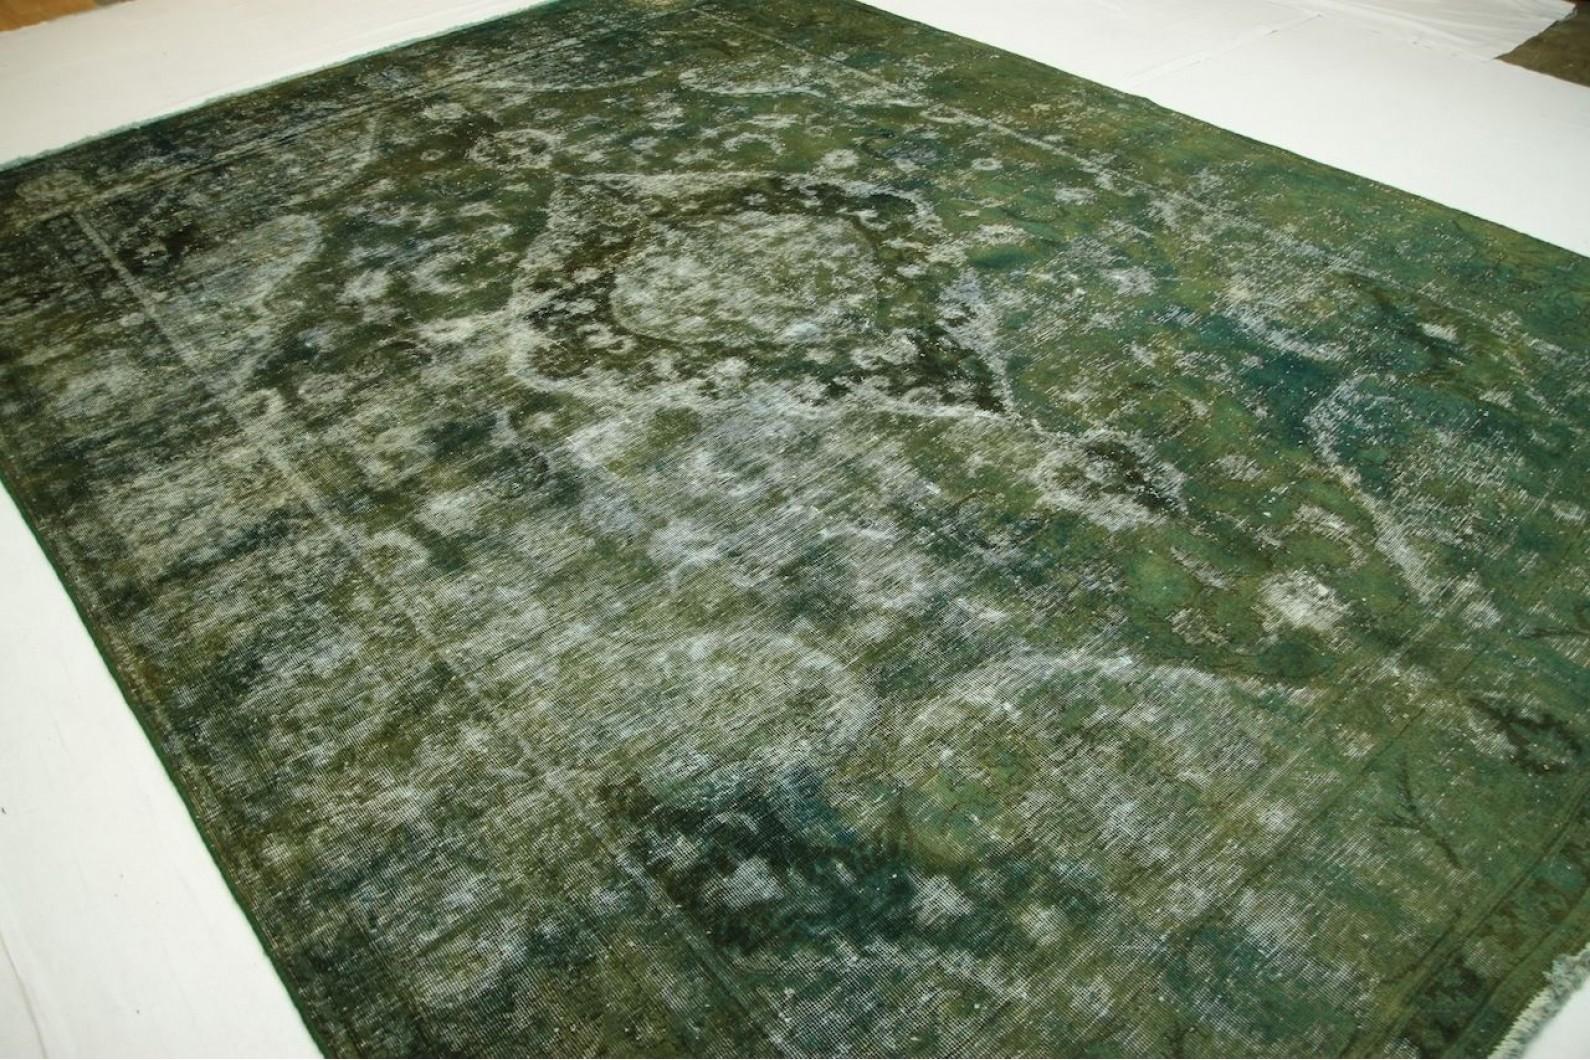 Teppich mintgrün  Vintage Teppich Grün Blau in 400x300cm (1001-2469) bei carpetido ...